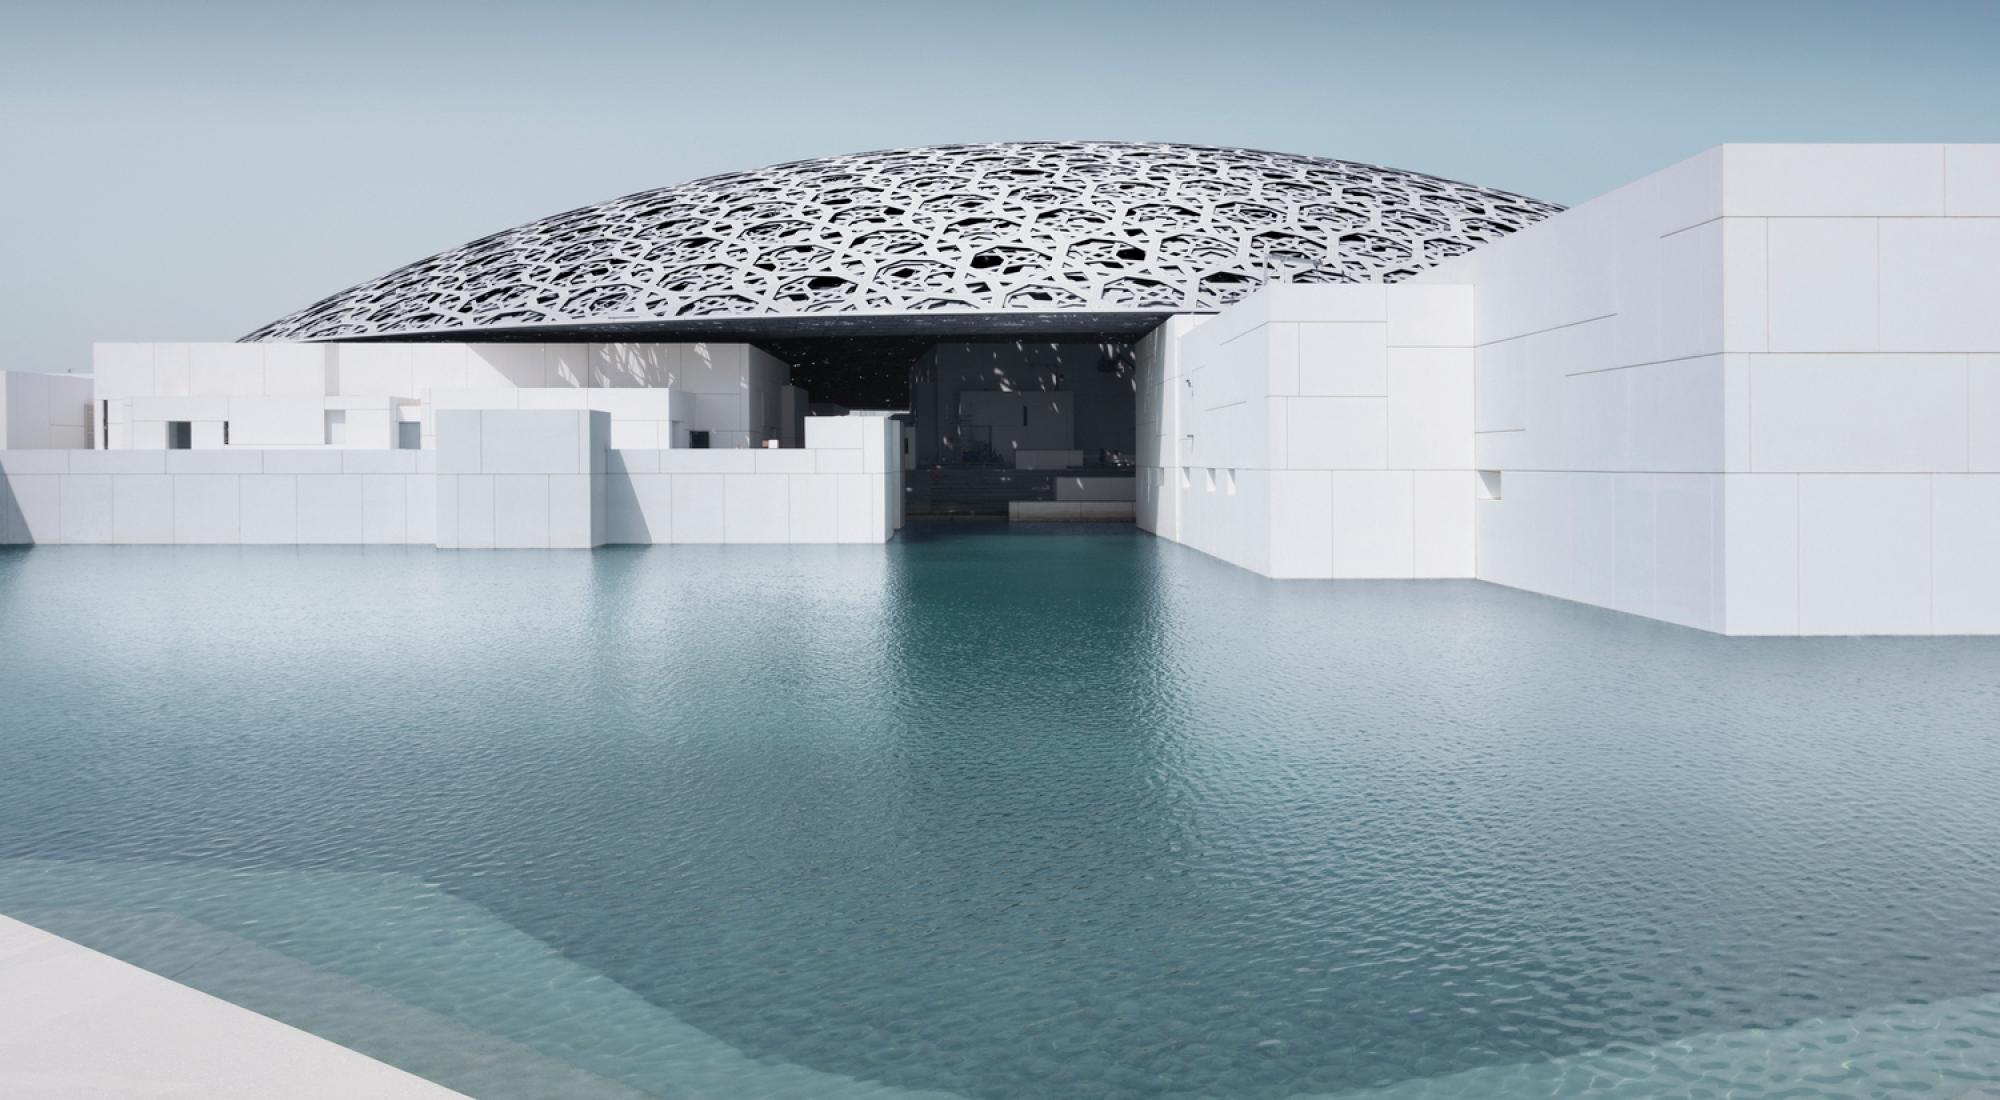 1._Louvre_Abu_Dhabi